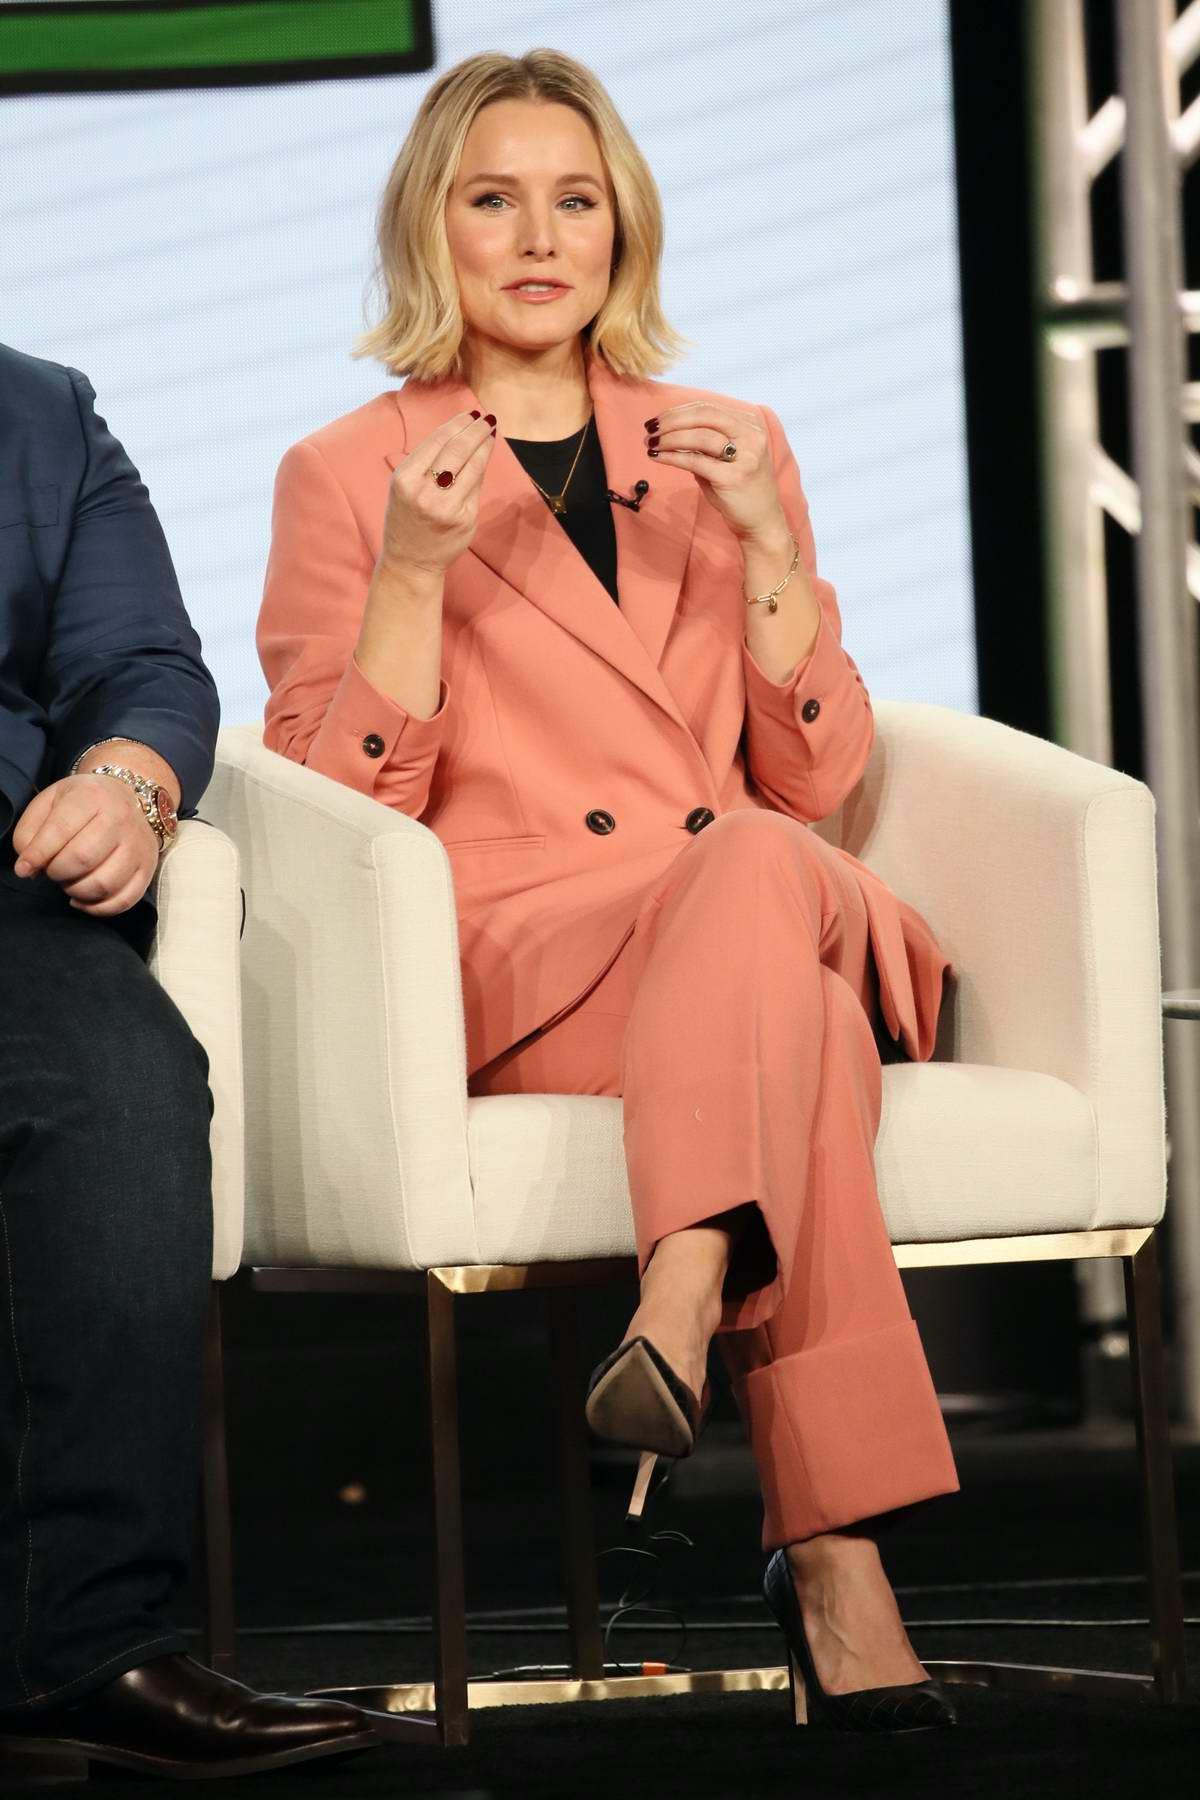 Kristen Bell attends Apple TV+ Winter TCA 2020 panel for 'Central Park' at The Langham in Pasadena, California